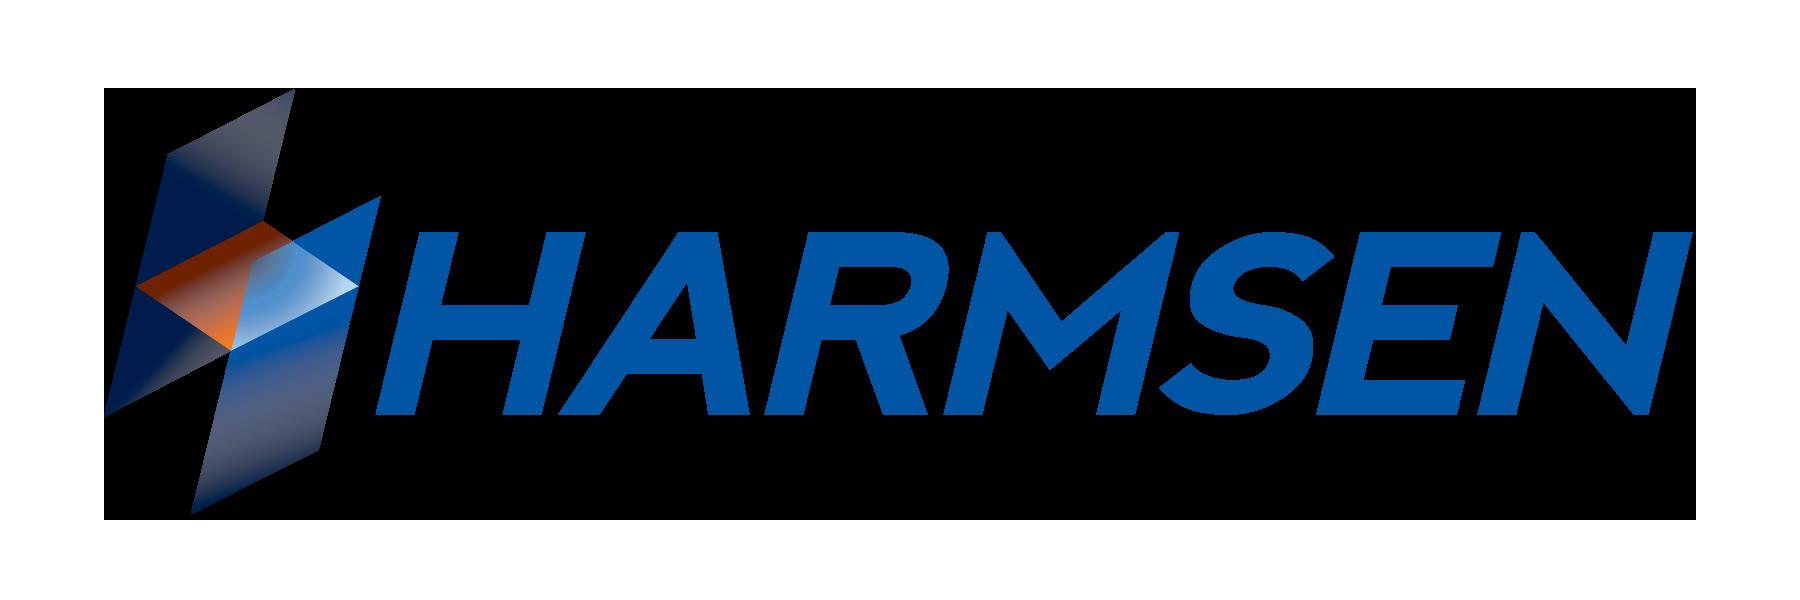 HARMSEN 2018 logo   FULL COLOR